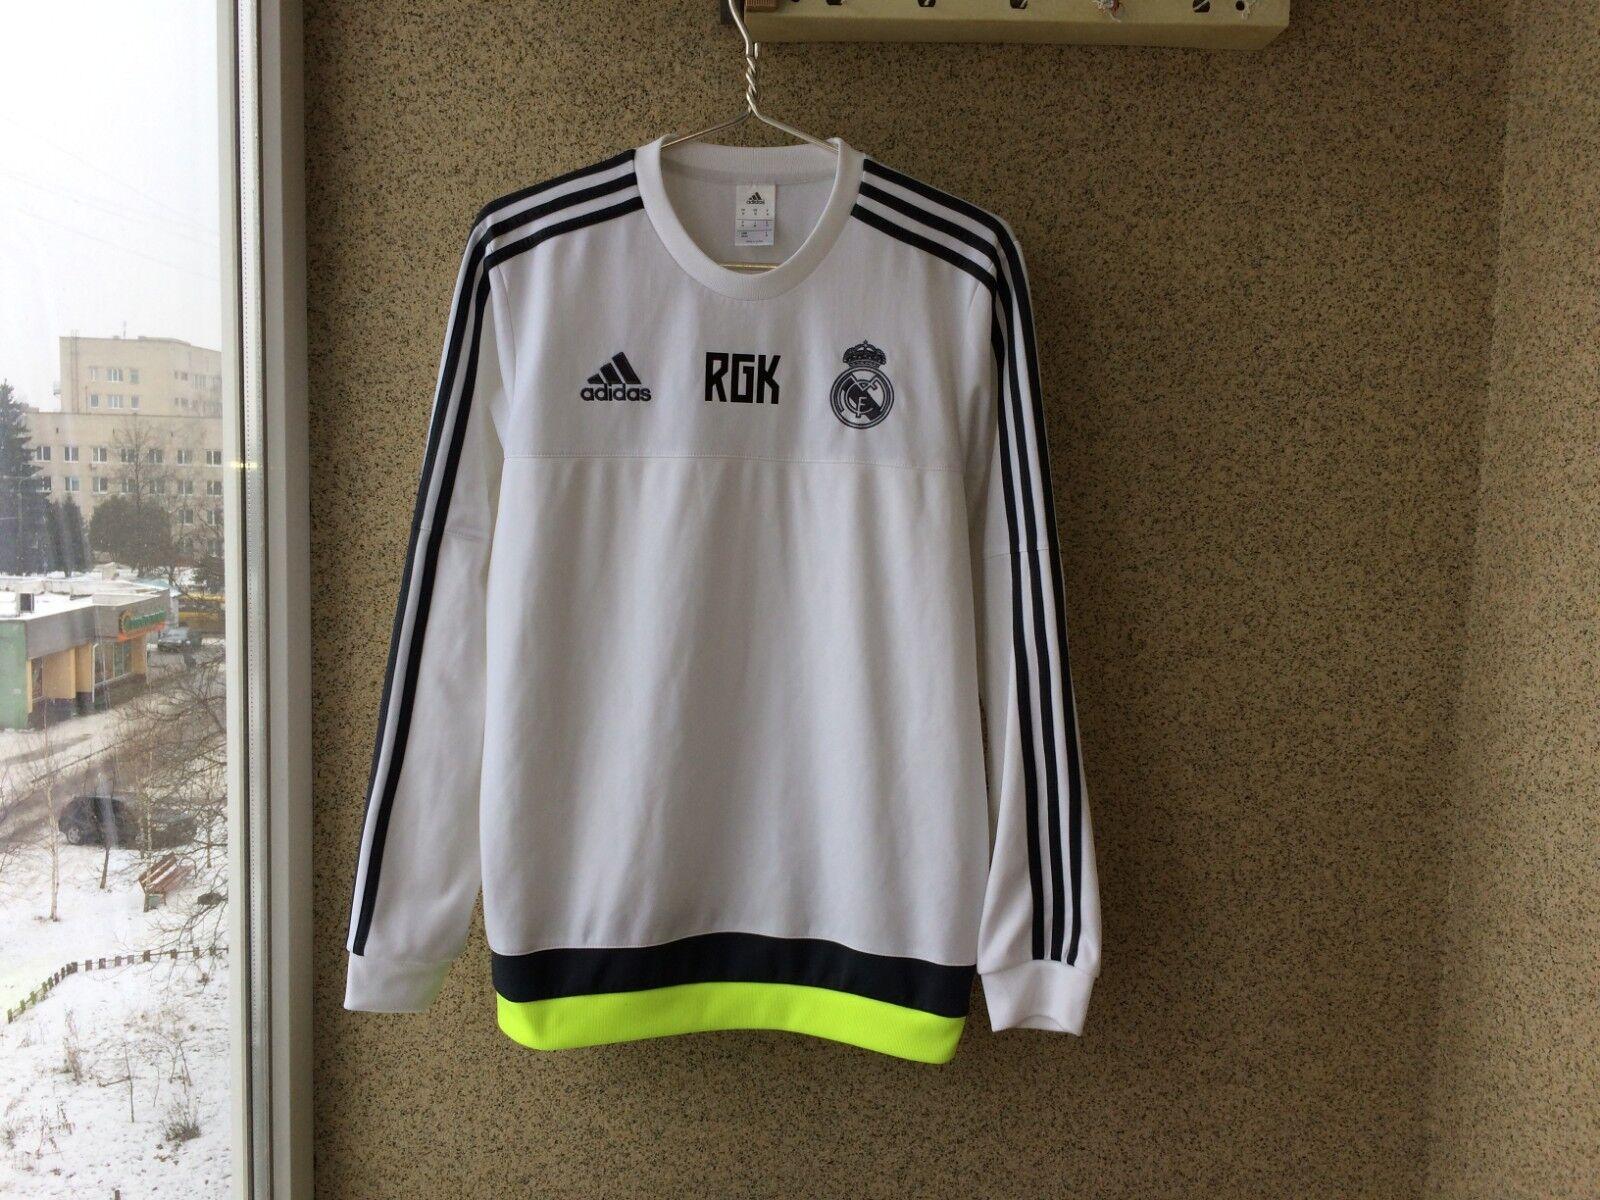 Chaqueta de fútbol Real Madrid 2015 2016 M Adidas España Fútbol Camiseta